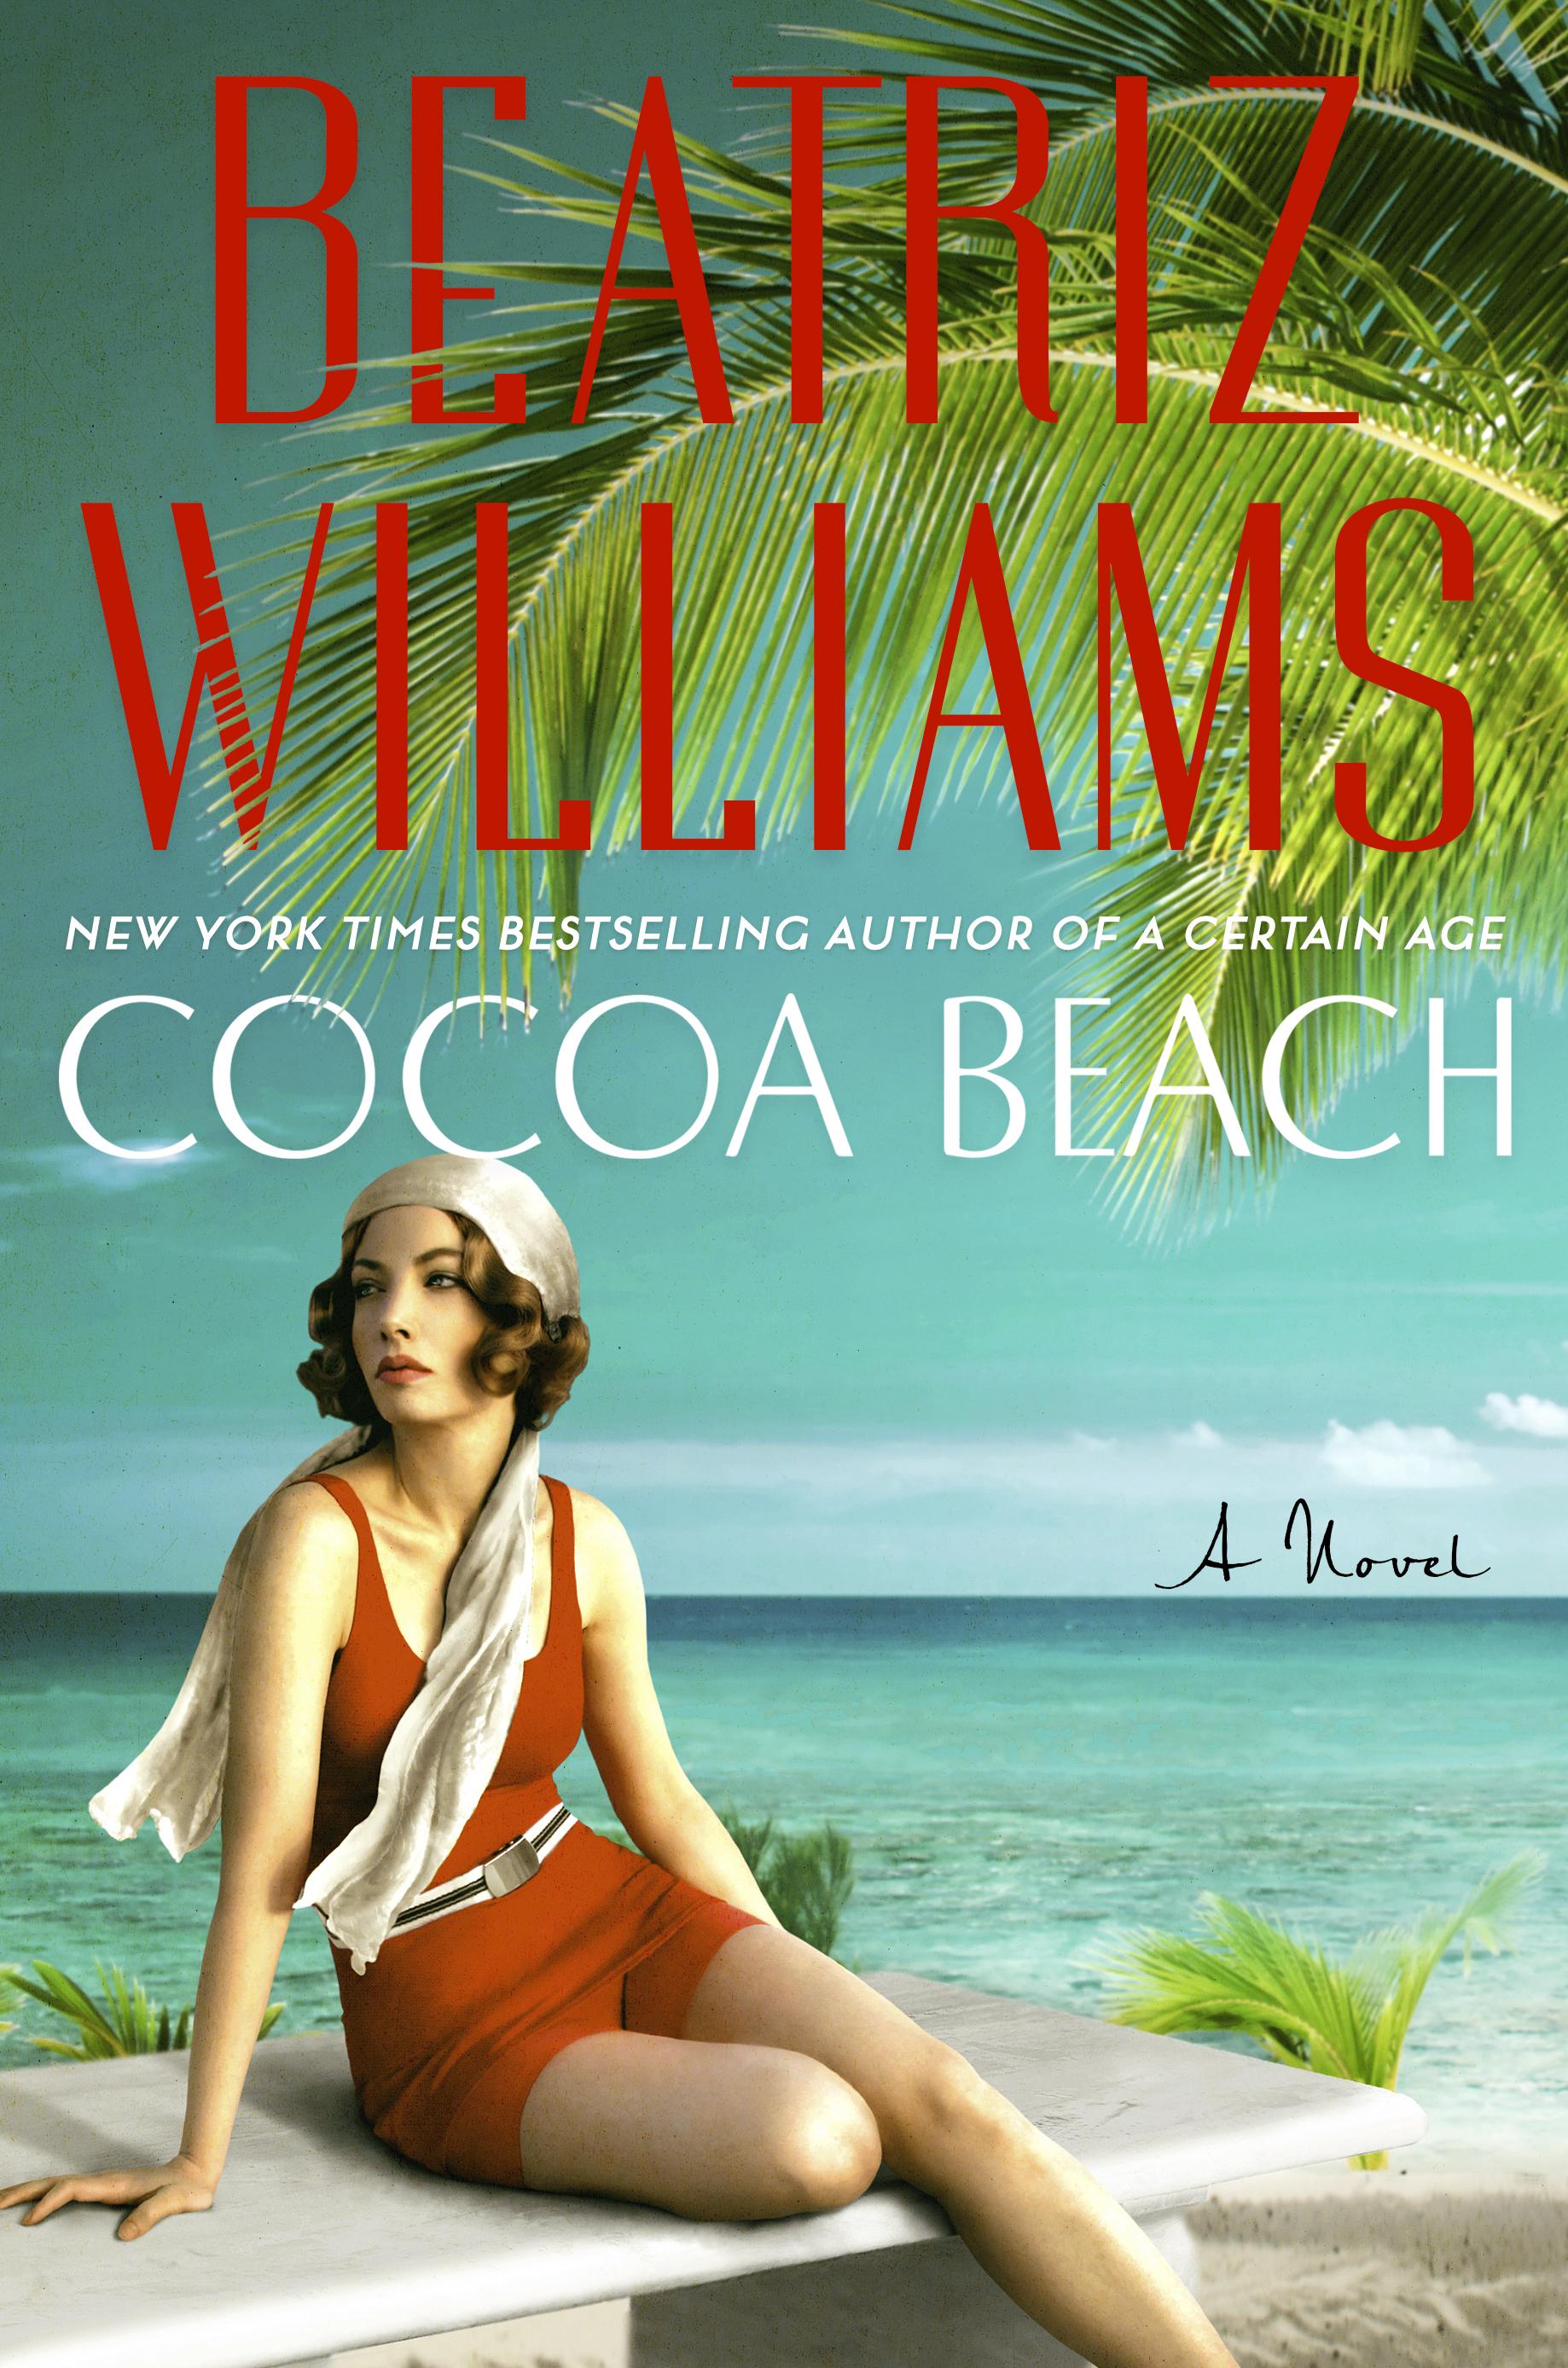 cocoabeach_cover.jpg